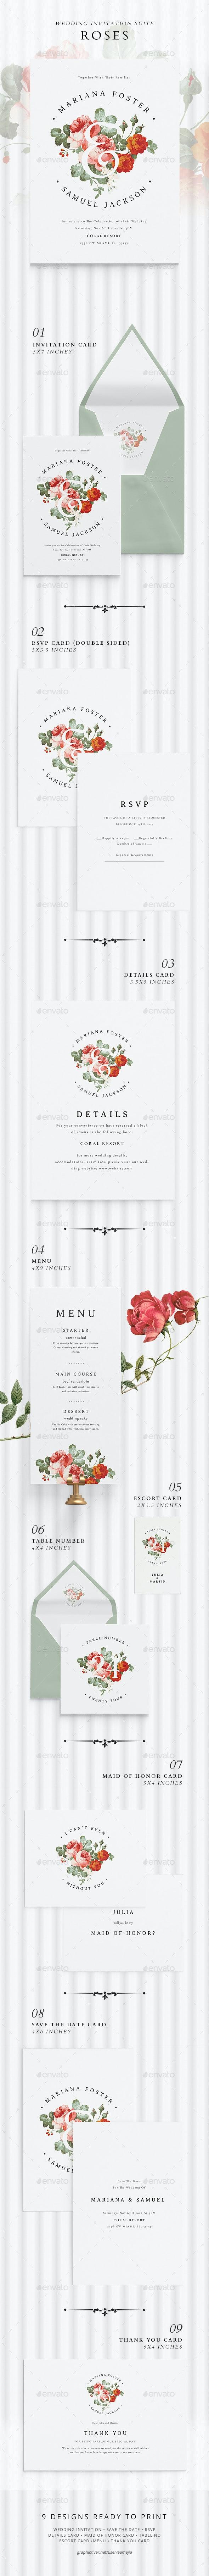 Wedding Invitation Suite - Roses - Weddings Cards & Invites